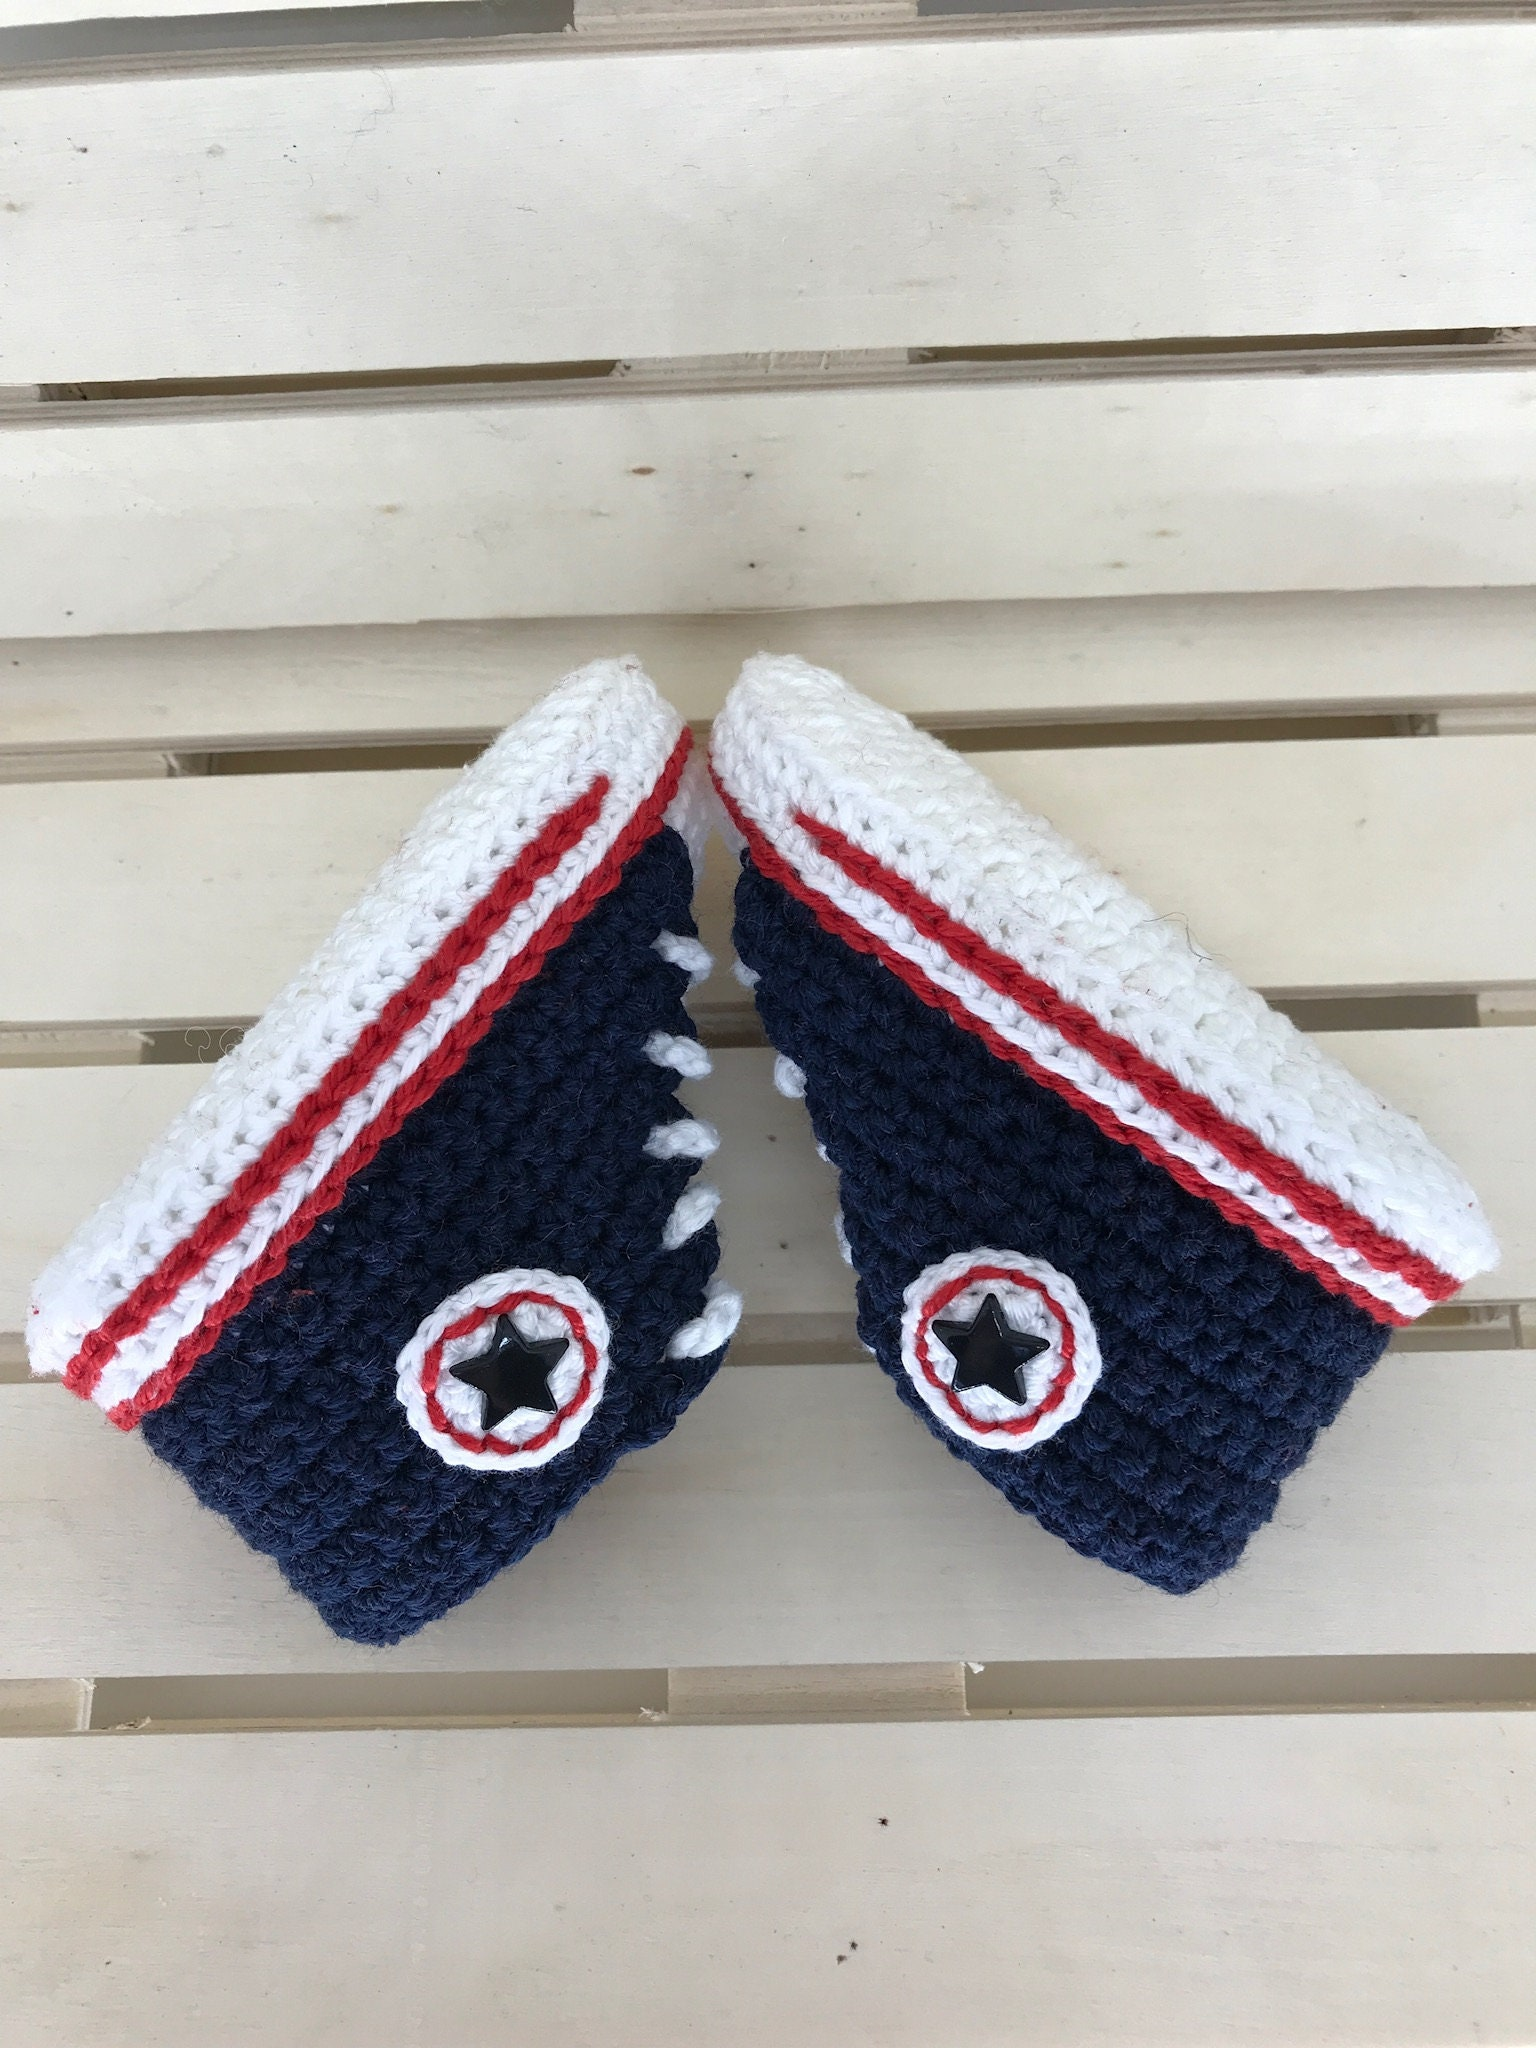 556efb54e Crochet baby sneakers blue navywhiteconverse stylewool